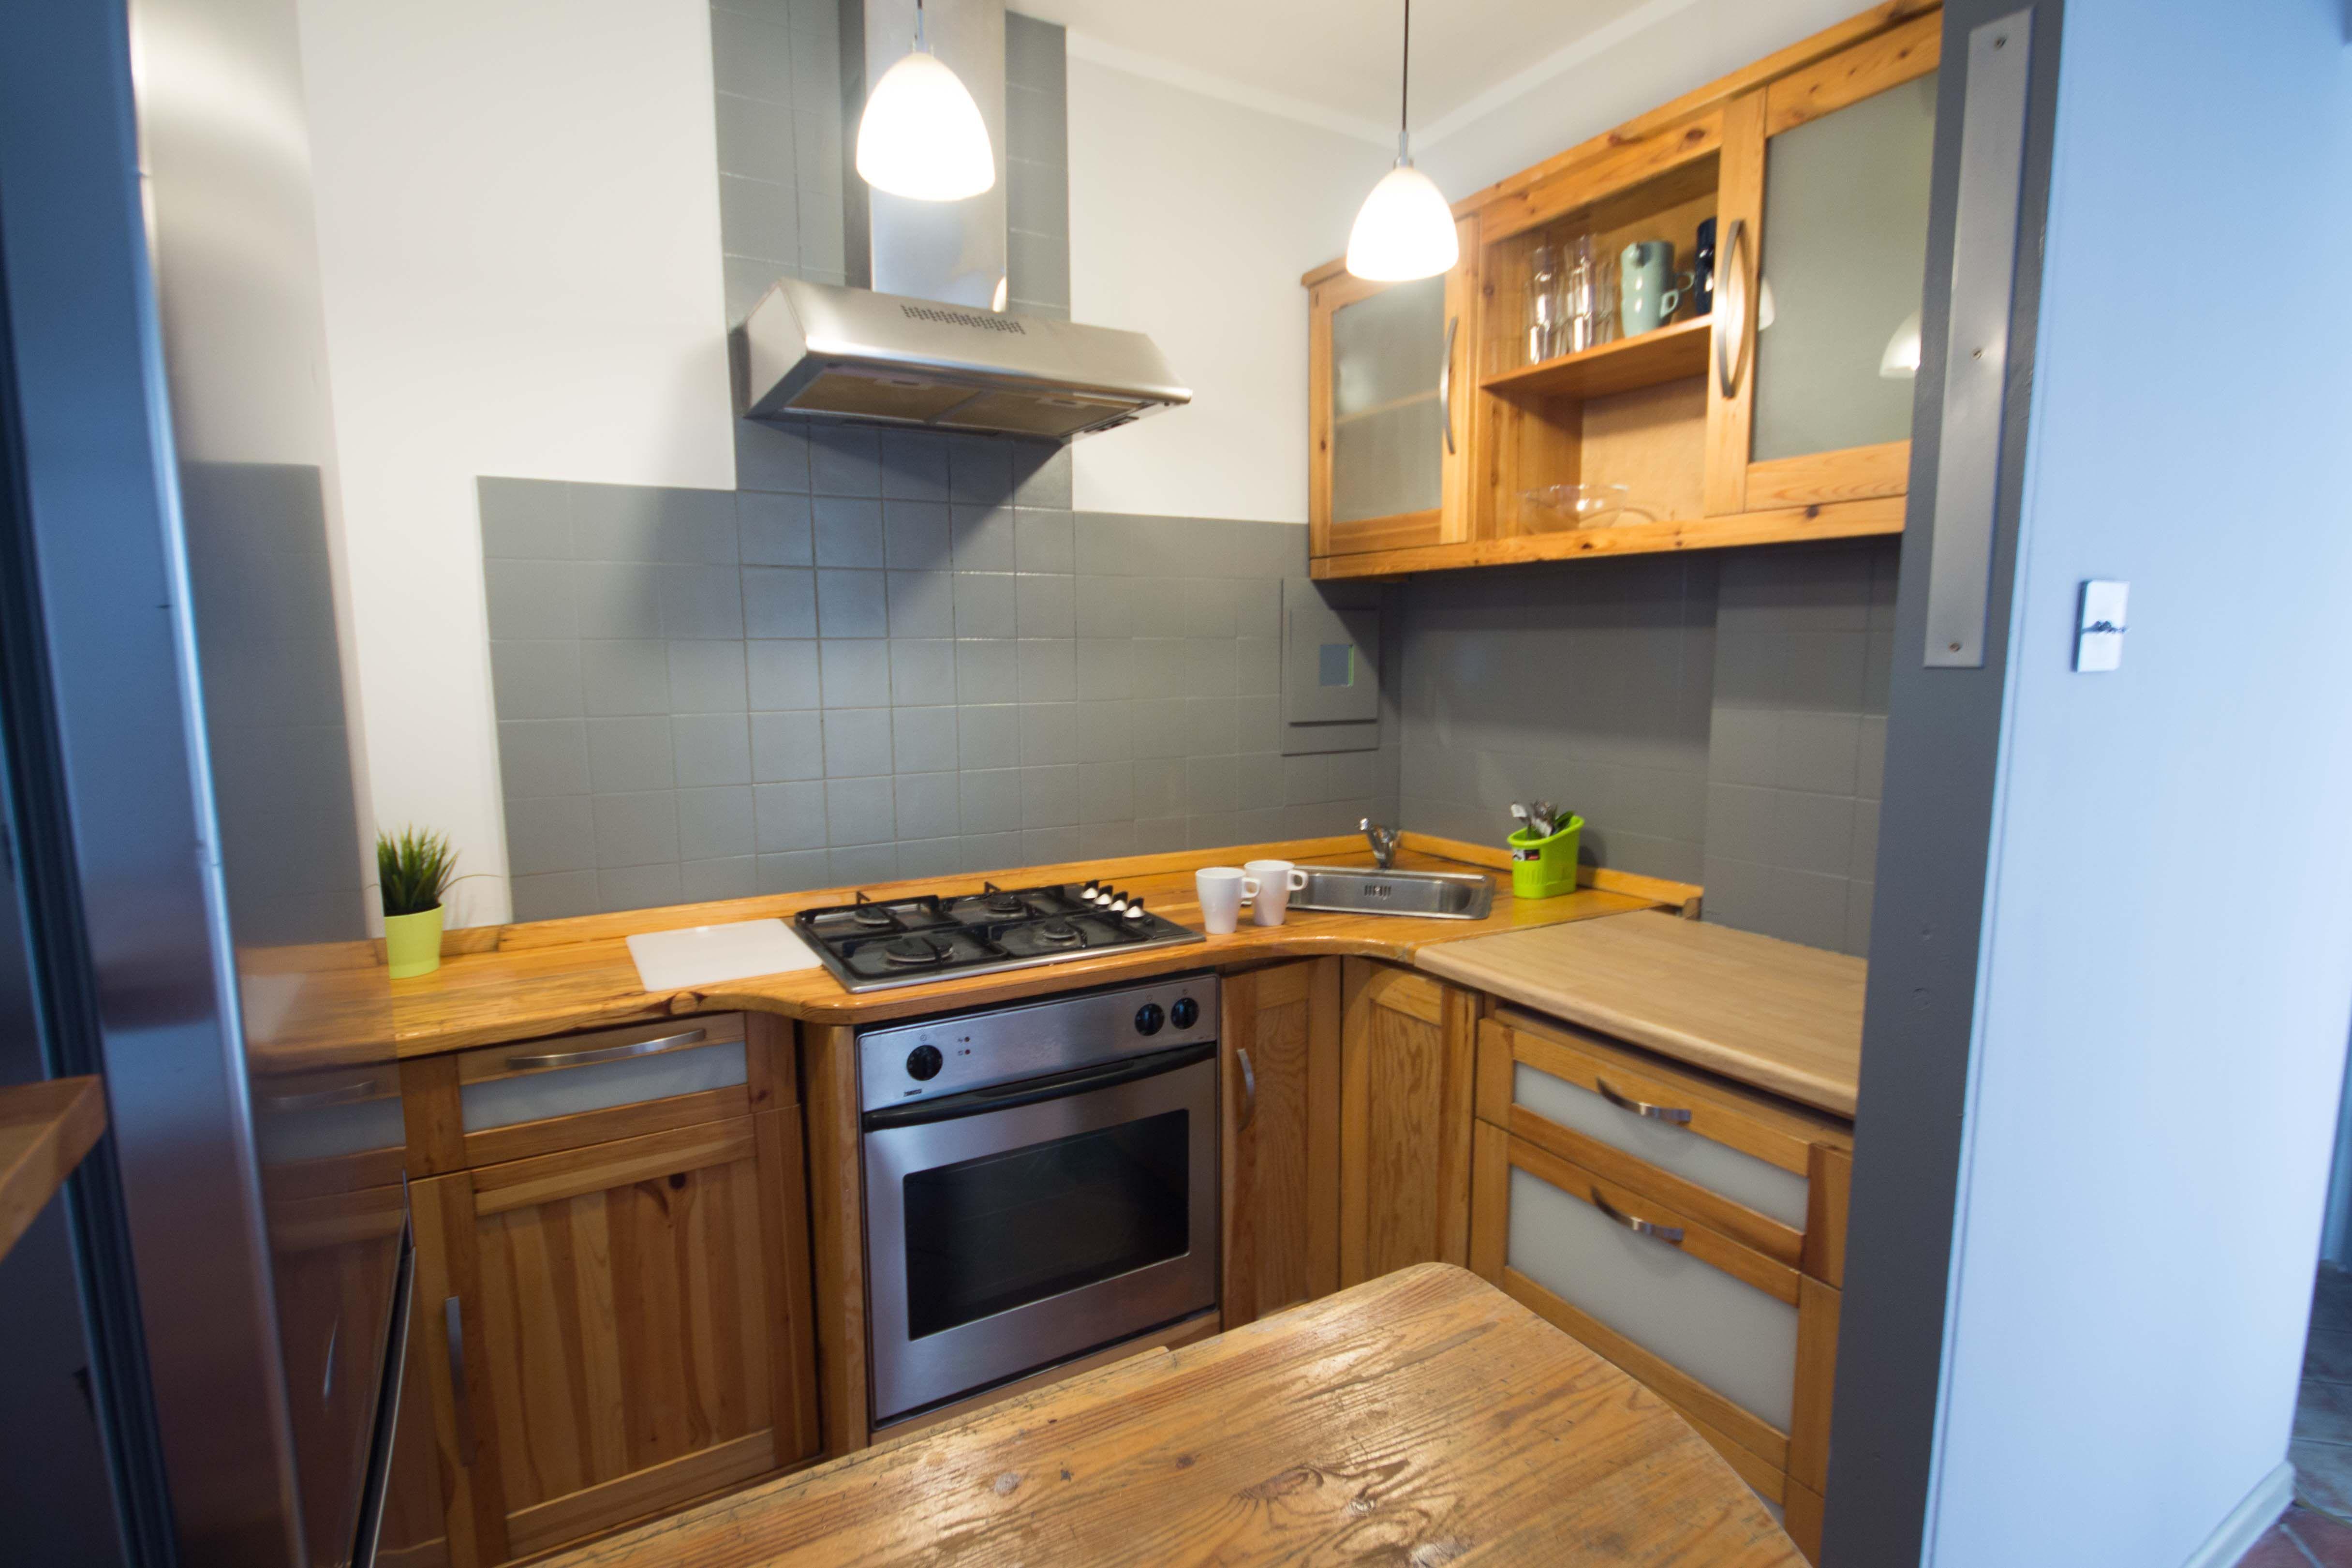 Flat Apartment Apartament Mieszkanie Aranzacja Zdjecie Mieszkanie Mieszkania Pokoj Kuchnia Salon Przedpokoj Garderoba Rem Home Decor Kitchen Home